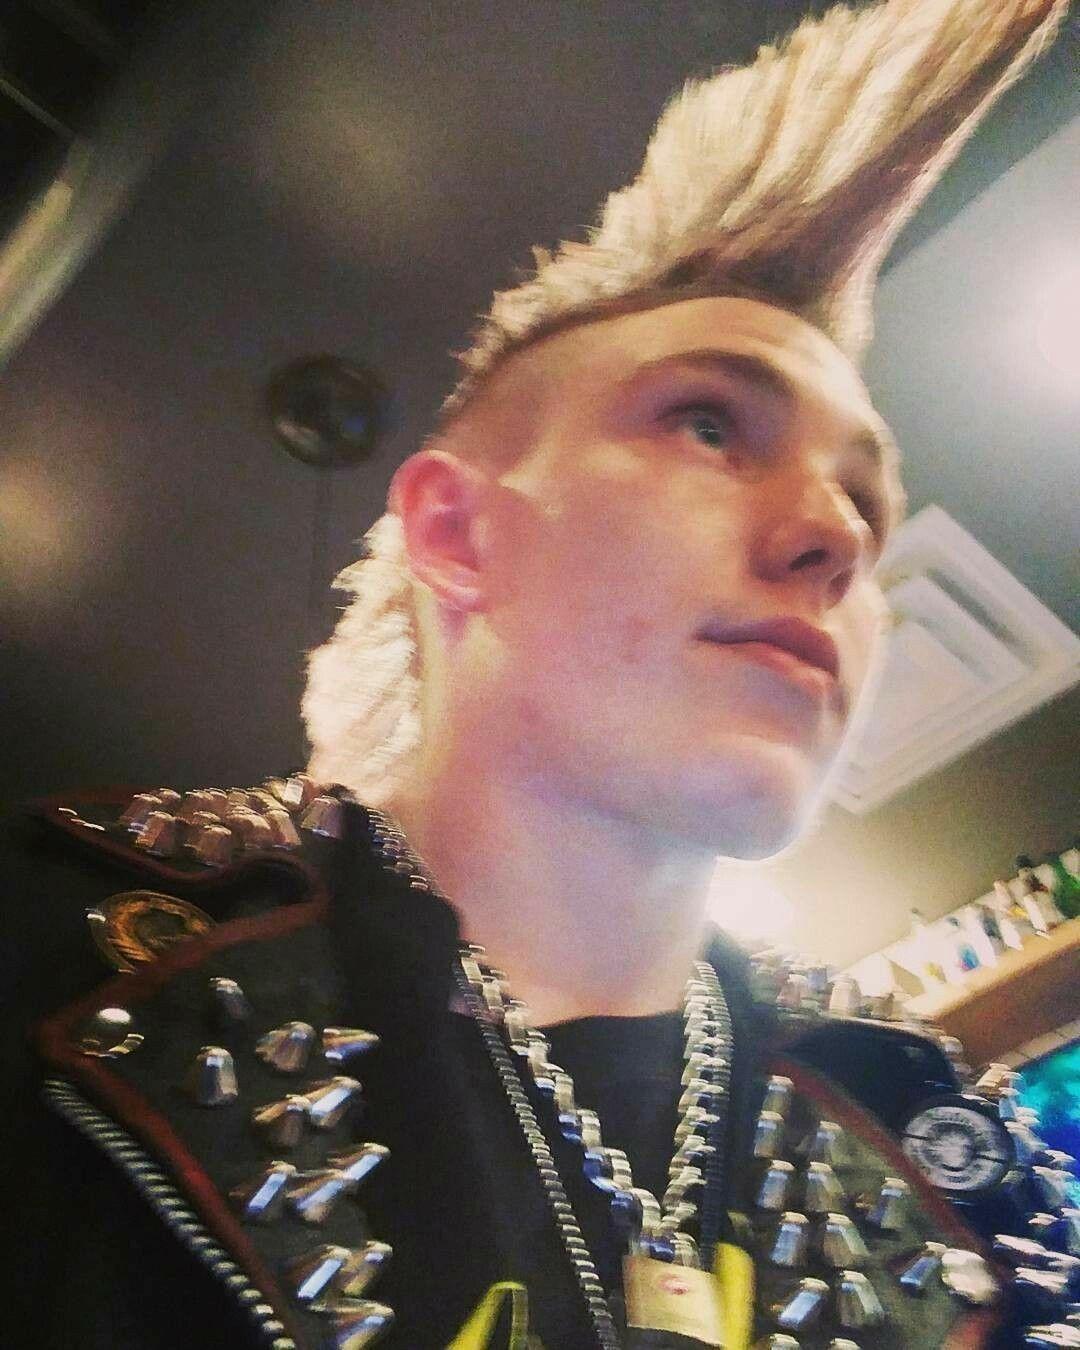 Pin by madcap on punk rock lifestyle pinterest punk rock punk